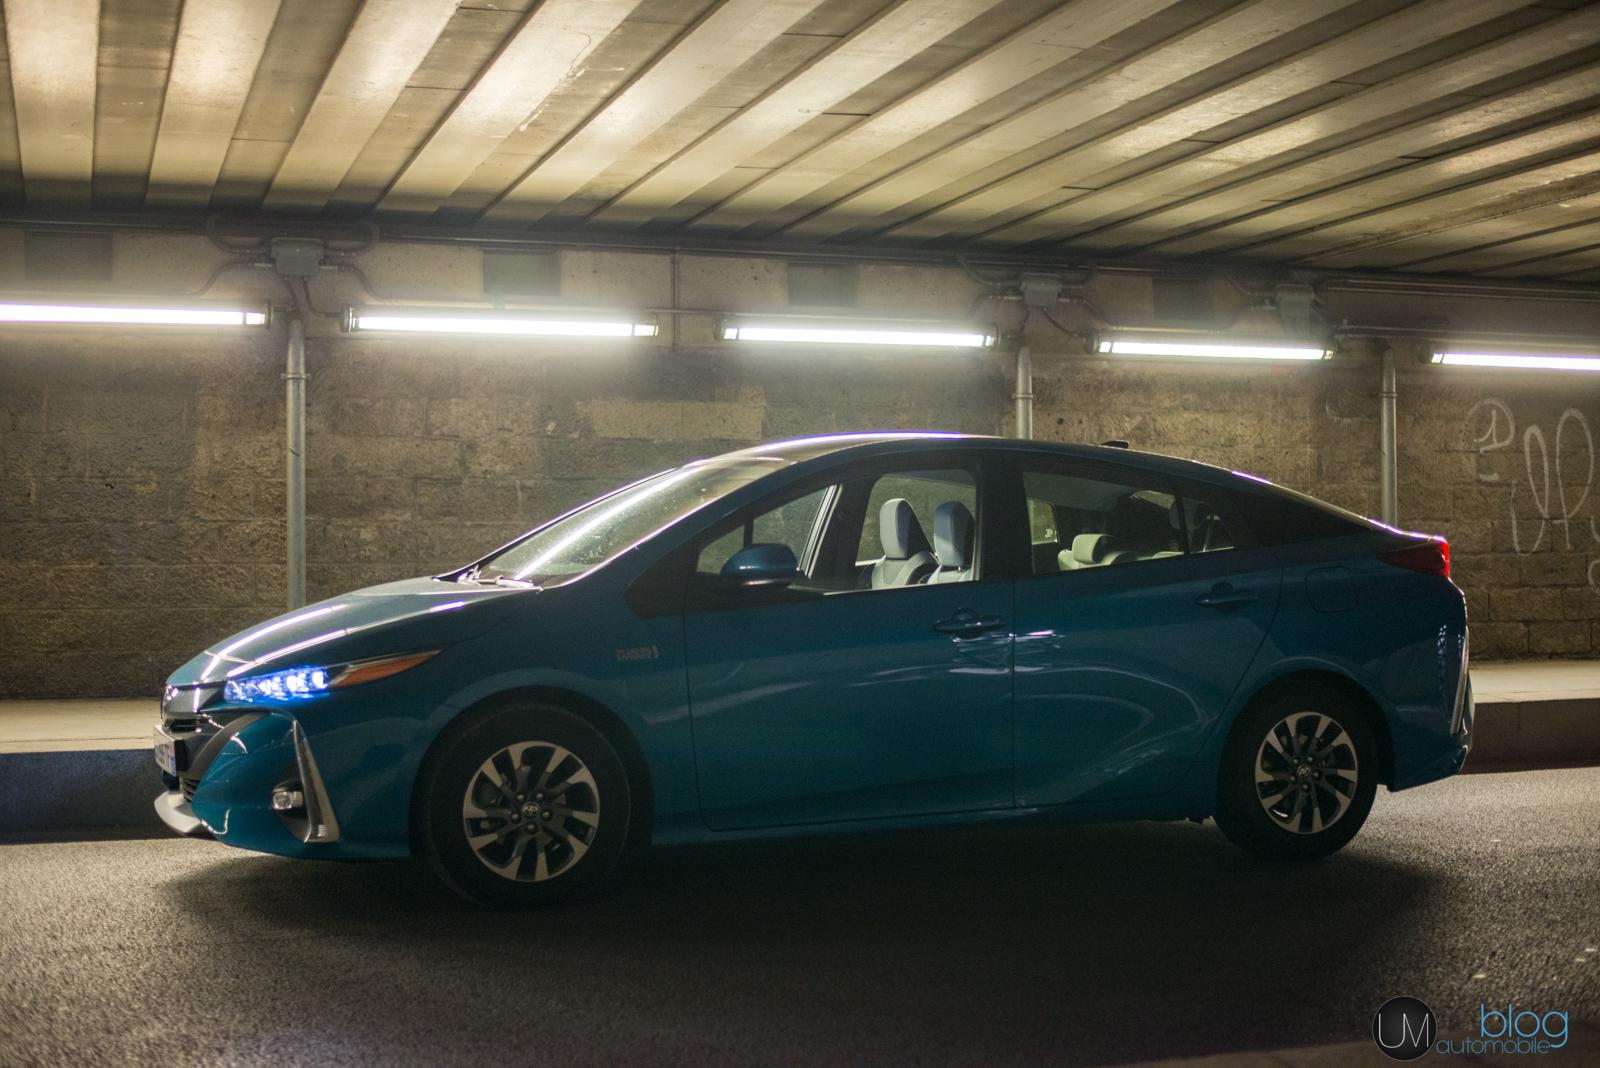 une semaine en toyota prius hybride rechargeable blog automobile. Black Bedroom Furniture Sets. Home Design Ideas